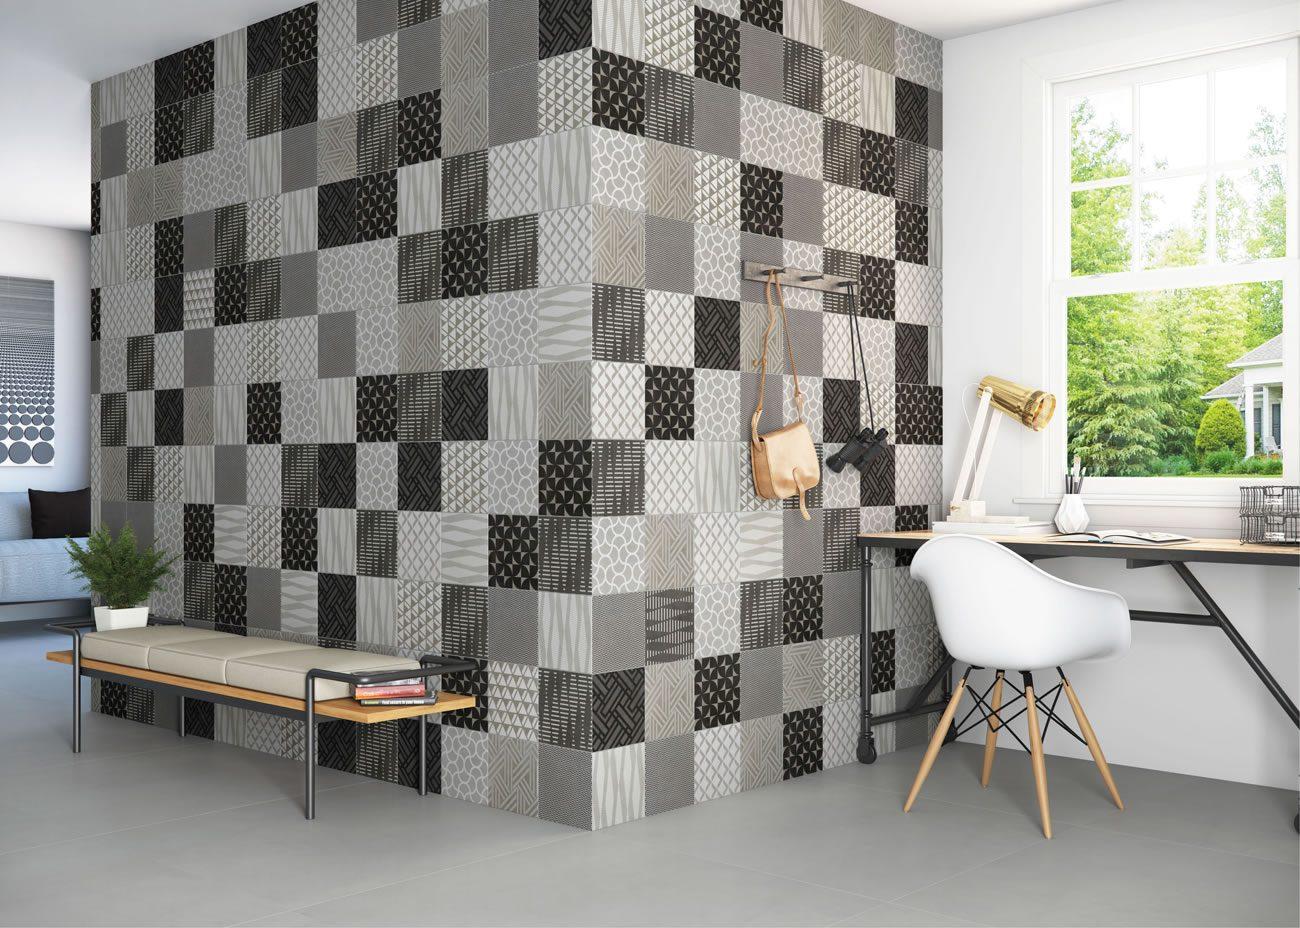 Ambiente Eliane: patchwork-cimento-ma-20x20cm_munari-cimento-ac-60x60cm-amb-01